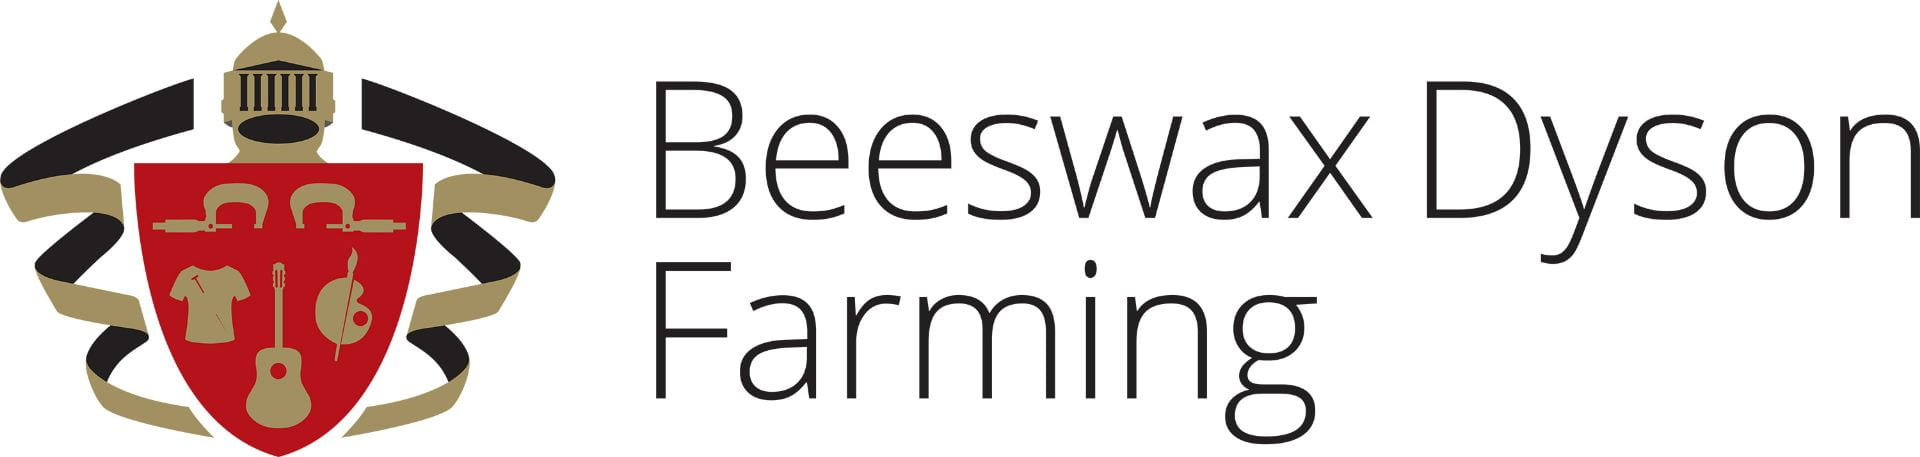 Beesewax Dyson Farming Logo.